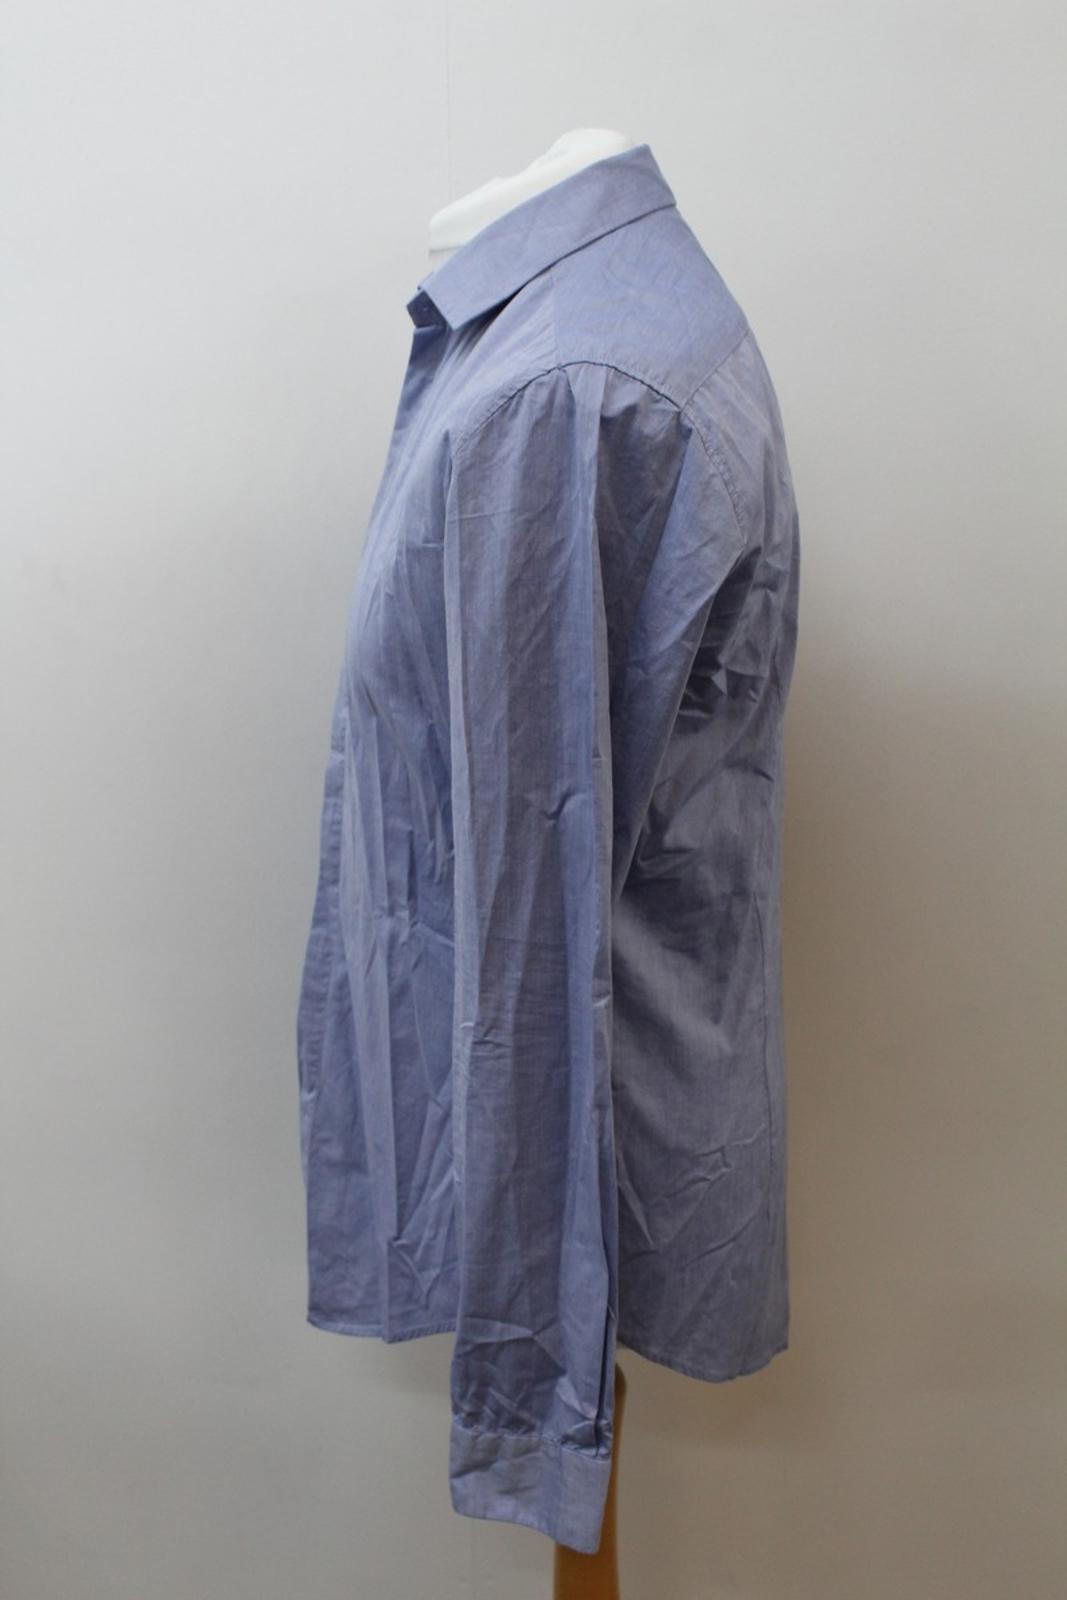 Boss-Orange-men-Azul-Algodon-Manga-Larga-Cuello-Con-Cuello-Informal-Camisa-Talla-M miniatura 6